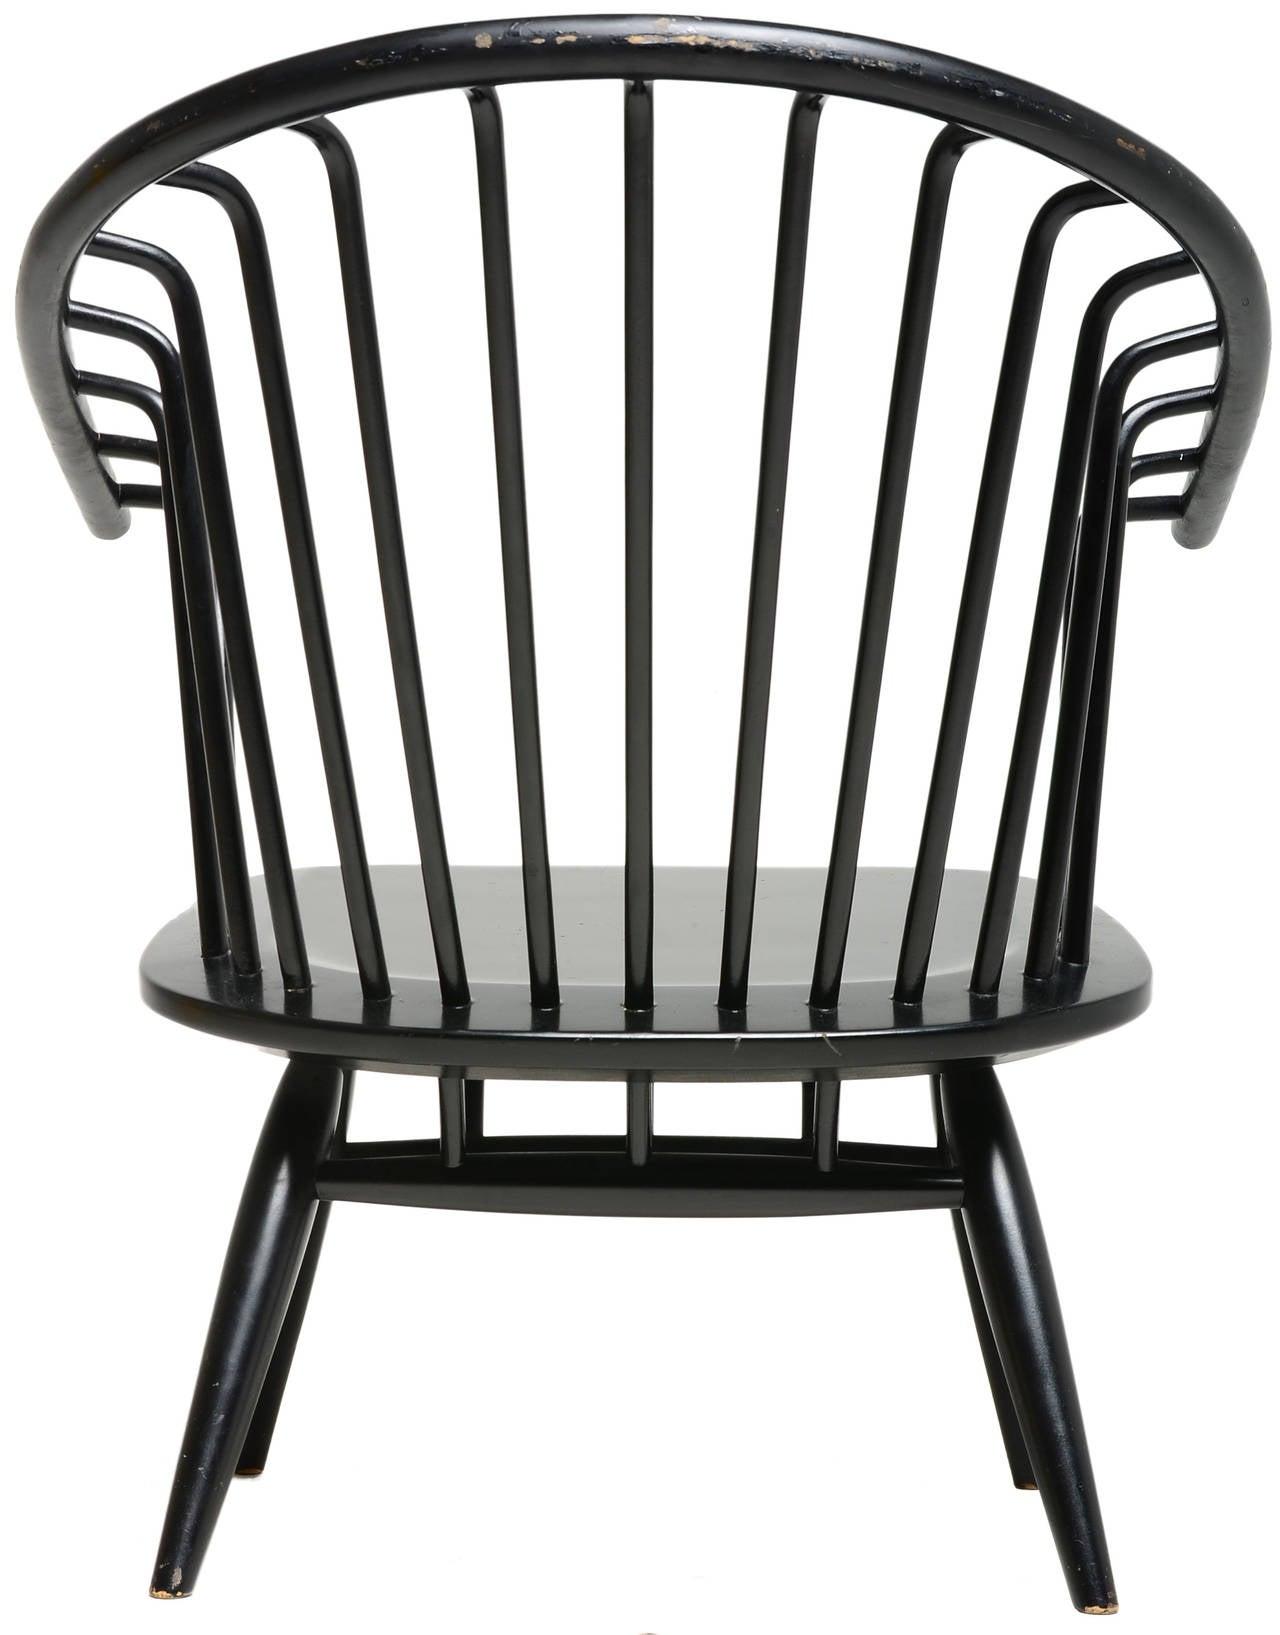 Finnish Ilmari Tapiovaara Crinolette Lounge Chair For Sale